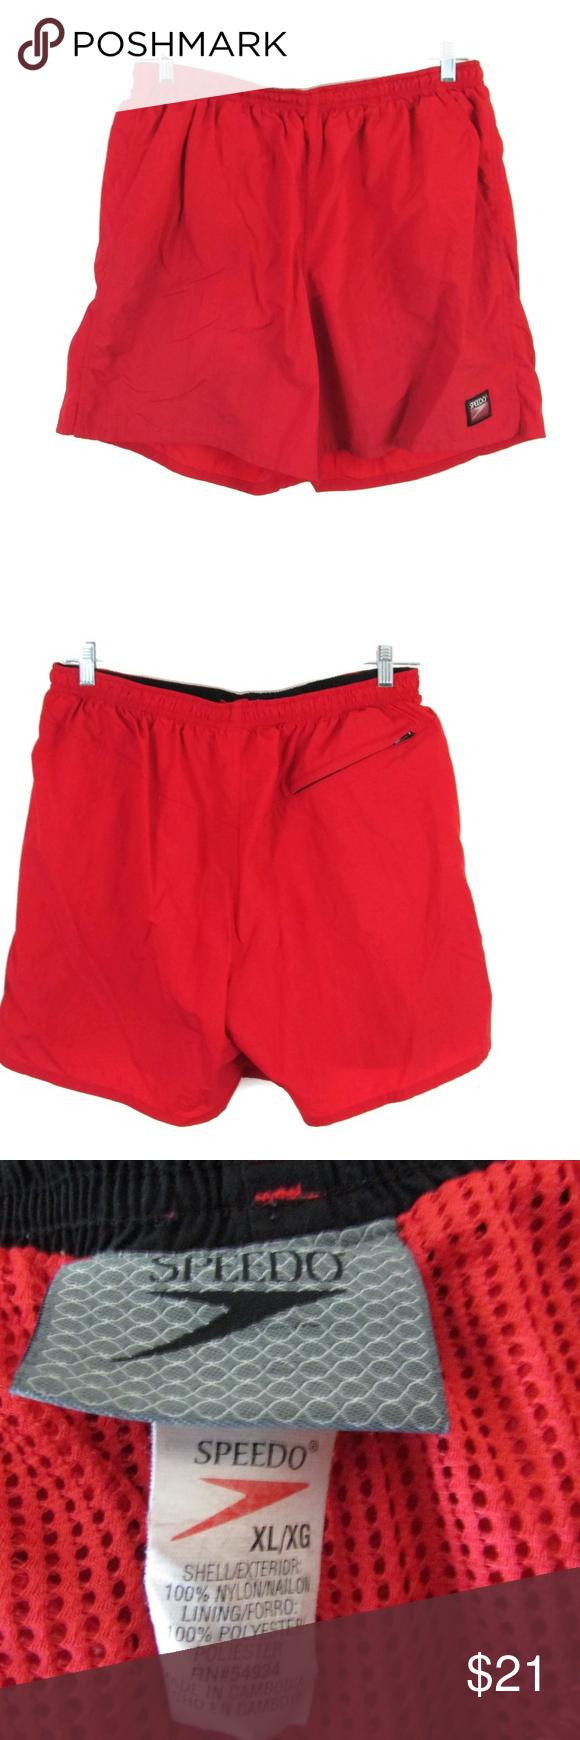 ab32d96785f72 Speedo Mens Swim Shorts Size XL Speedo Mens Swim Shorts Elastic Draw String  Waist Size XL Red Very Good Condition. Flat Lay Measurements Waist 17